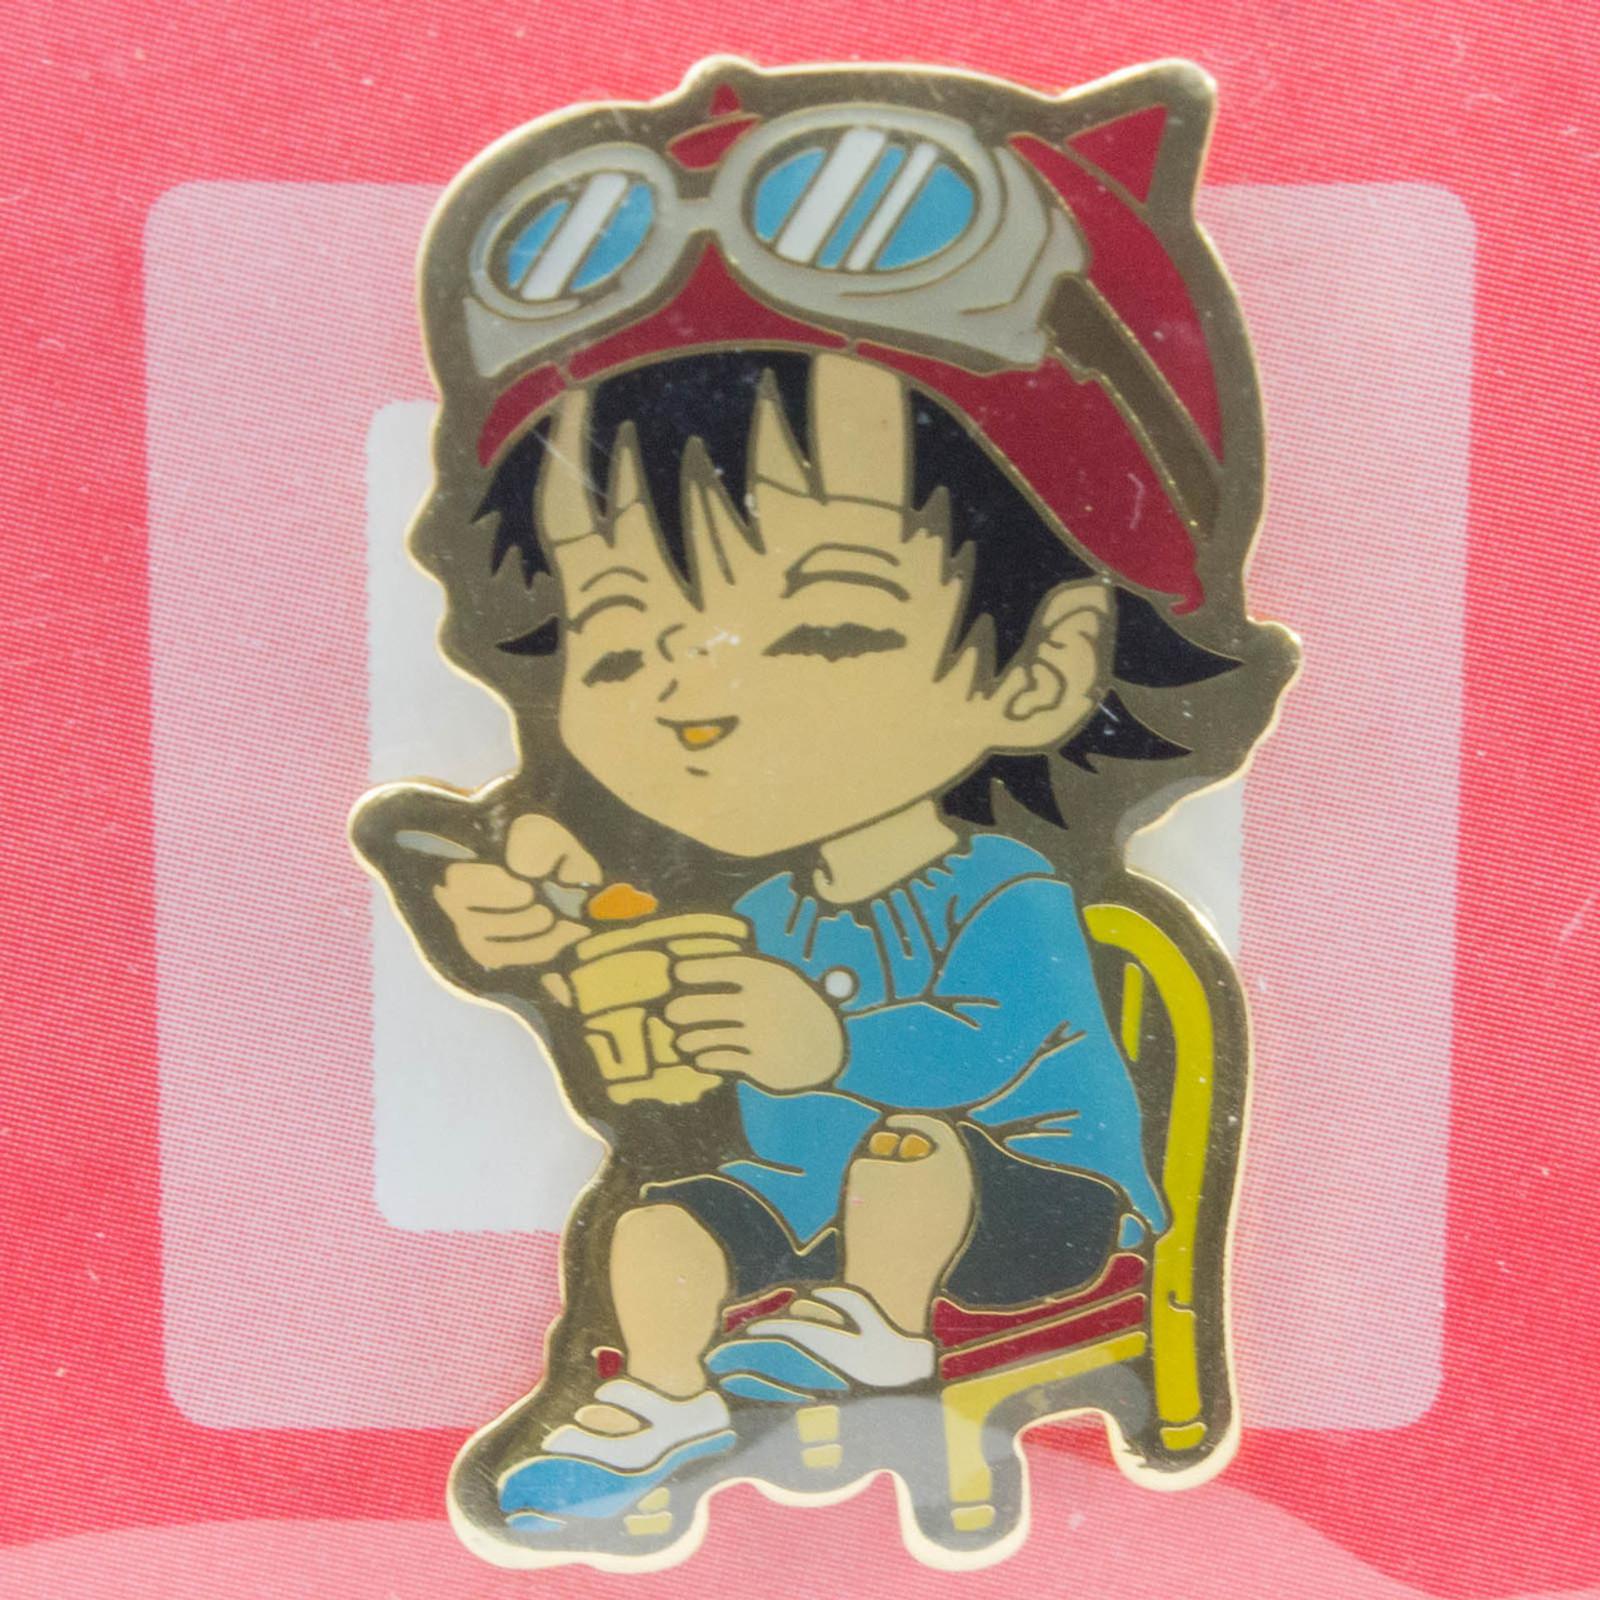 Sket Dance Bossun Yusuke Fujisaki Character Pins Shonen Jump JAPAN ANIME MANGA